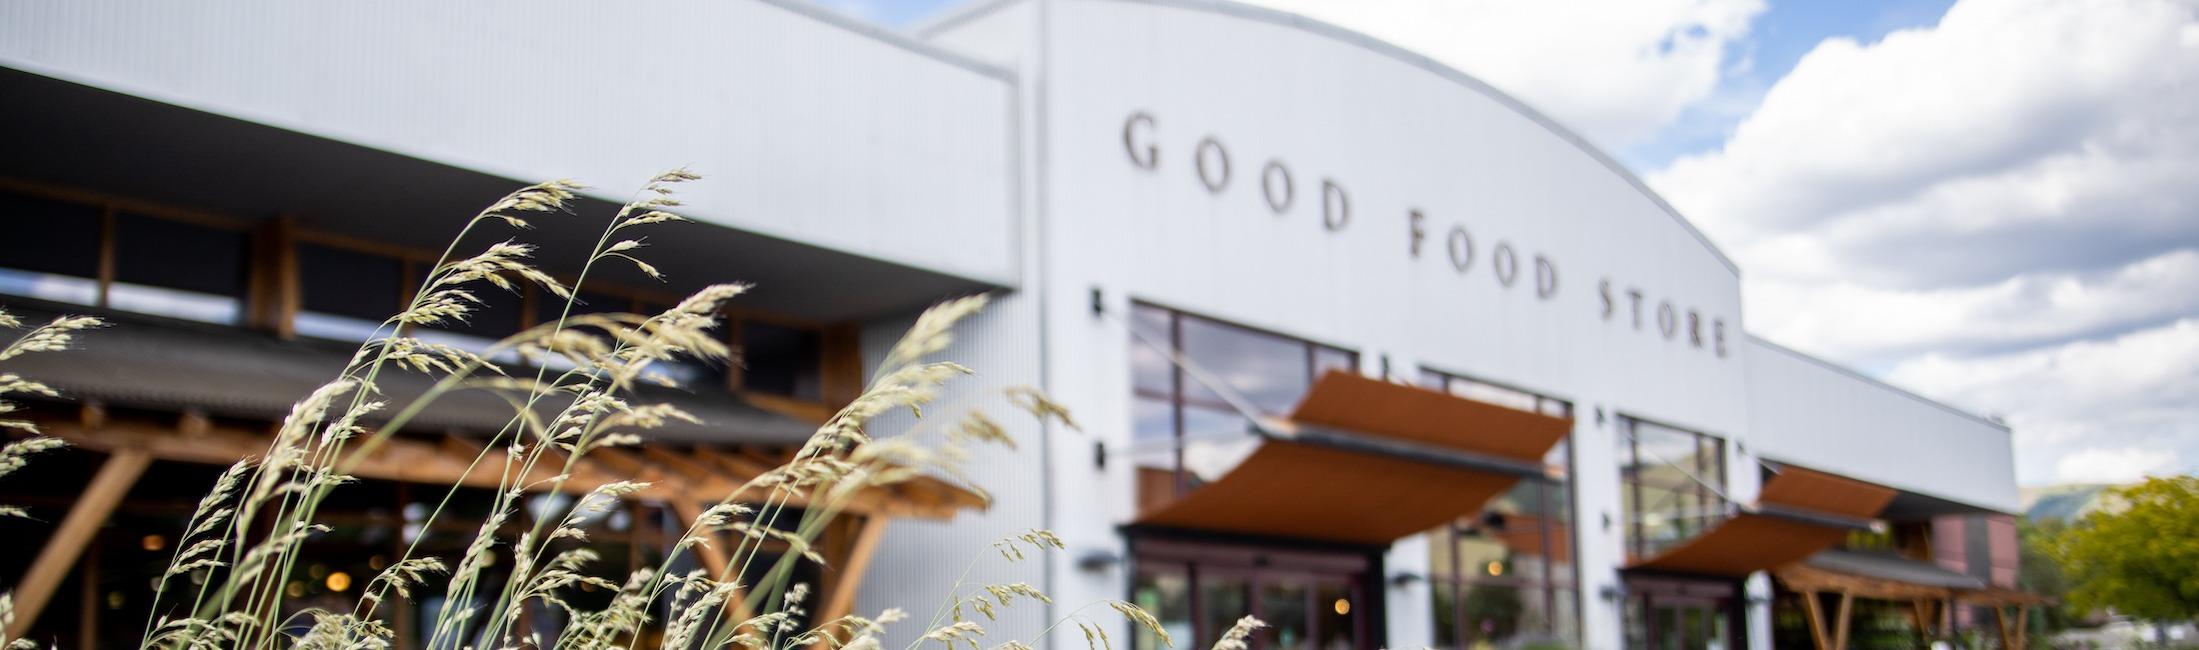 INSPIRE Missoula: Good Food Store